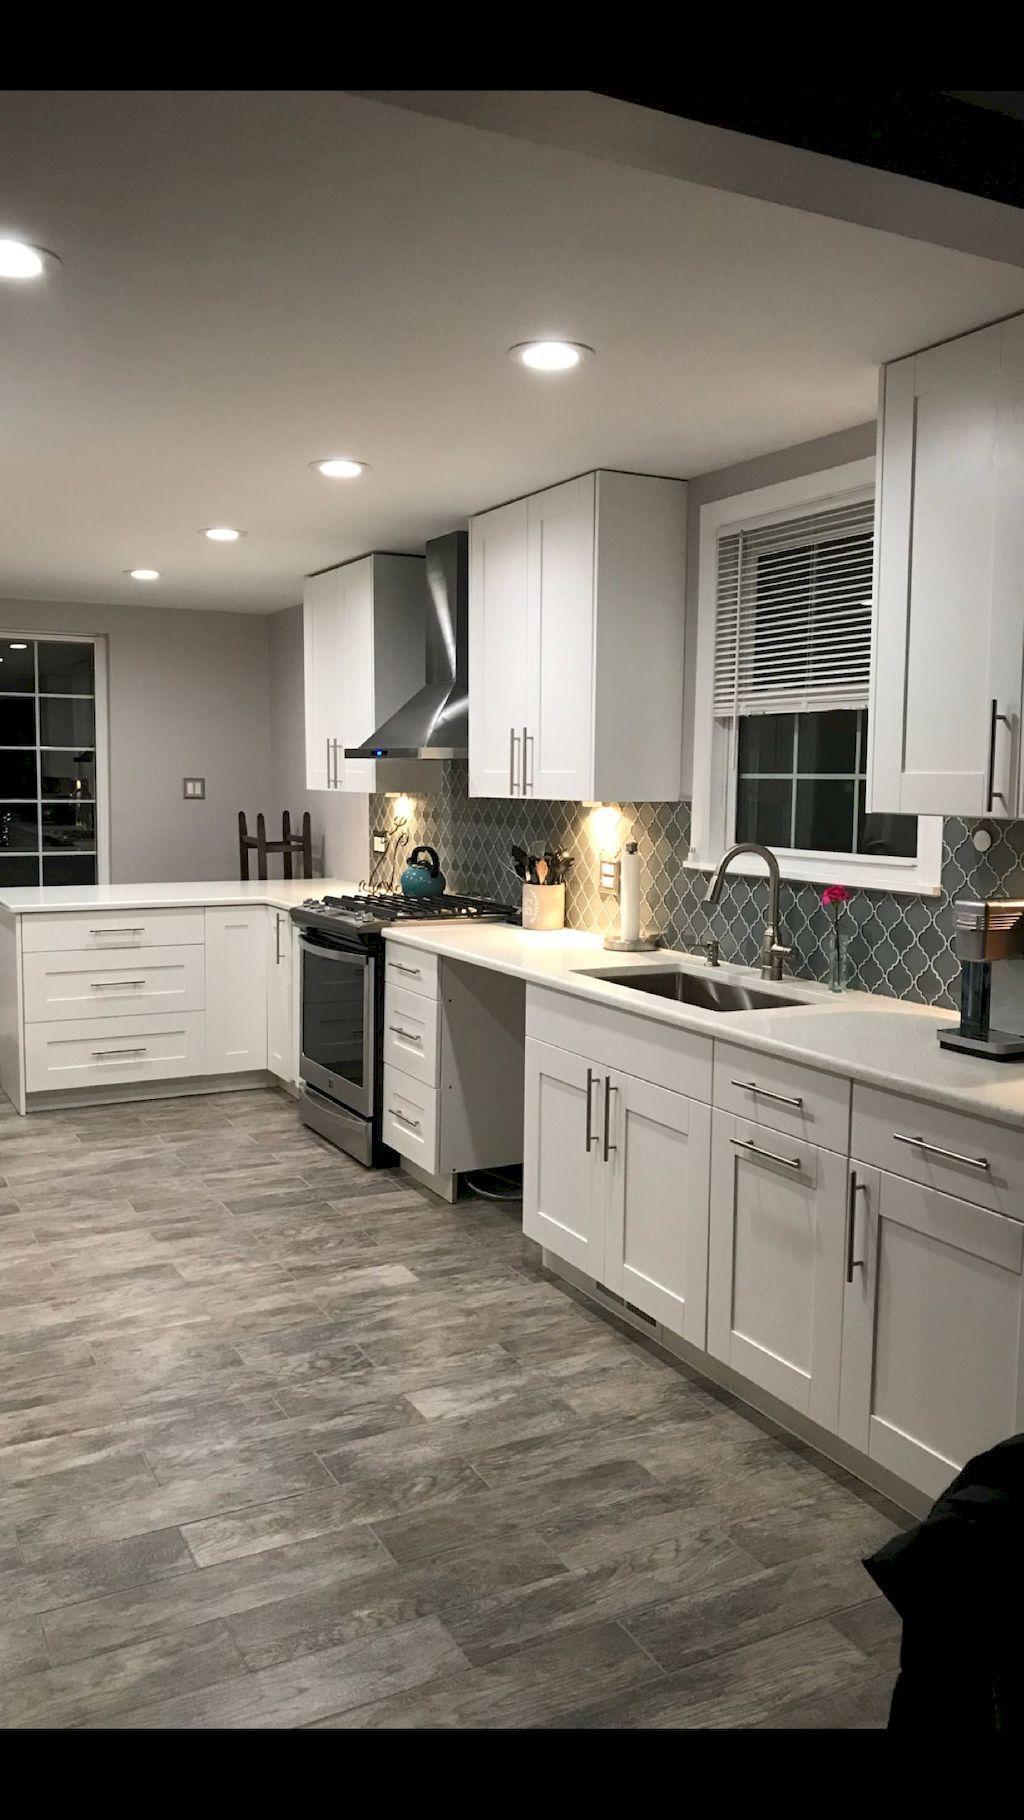 01 Farmhouse Kitchen Backsplash Design Ideas in 2020 ...